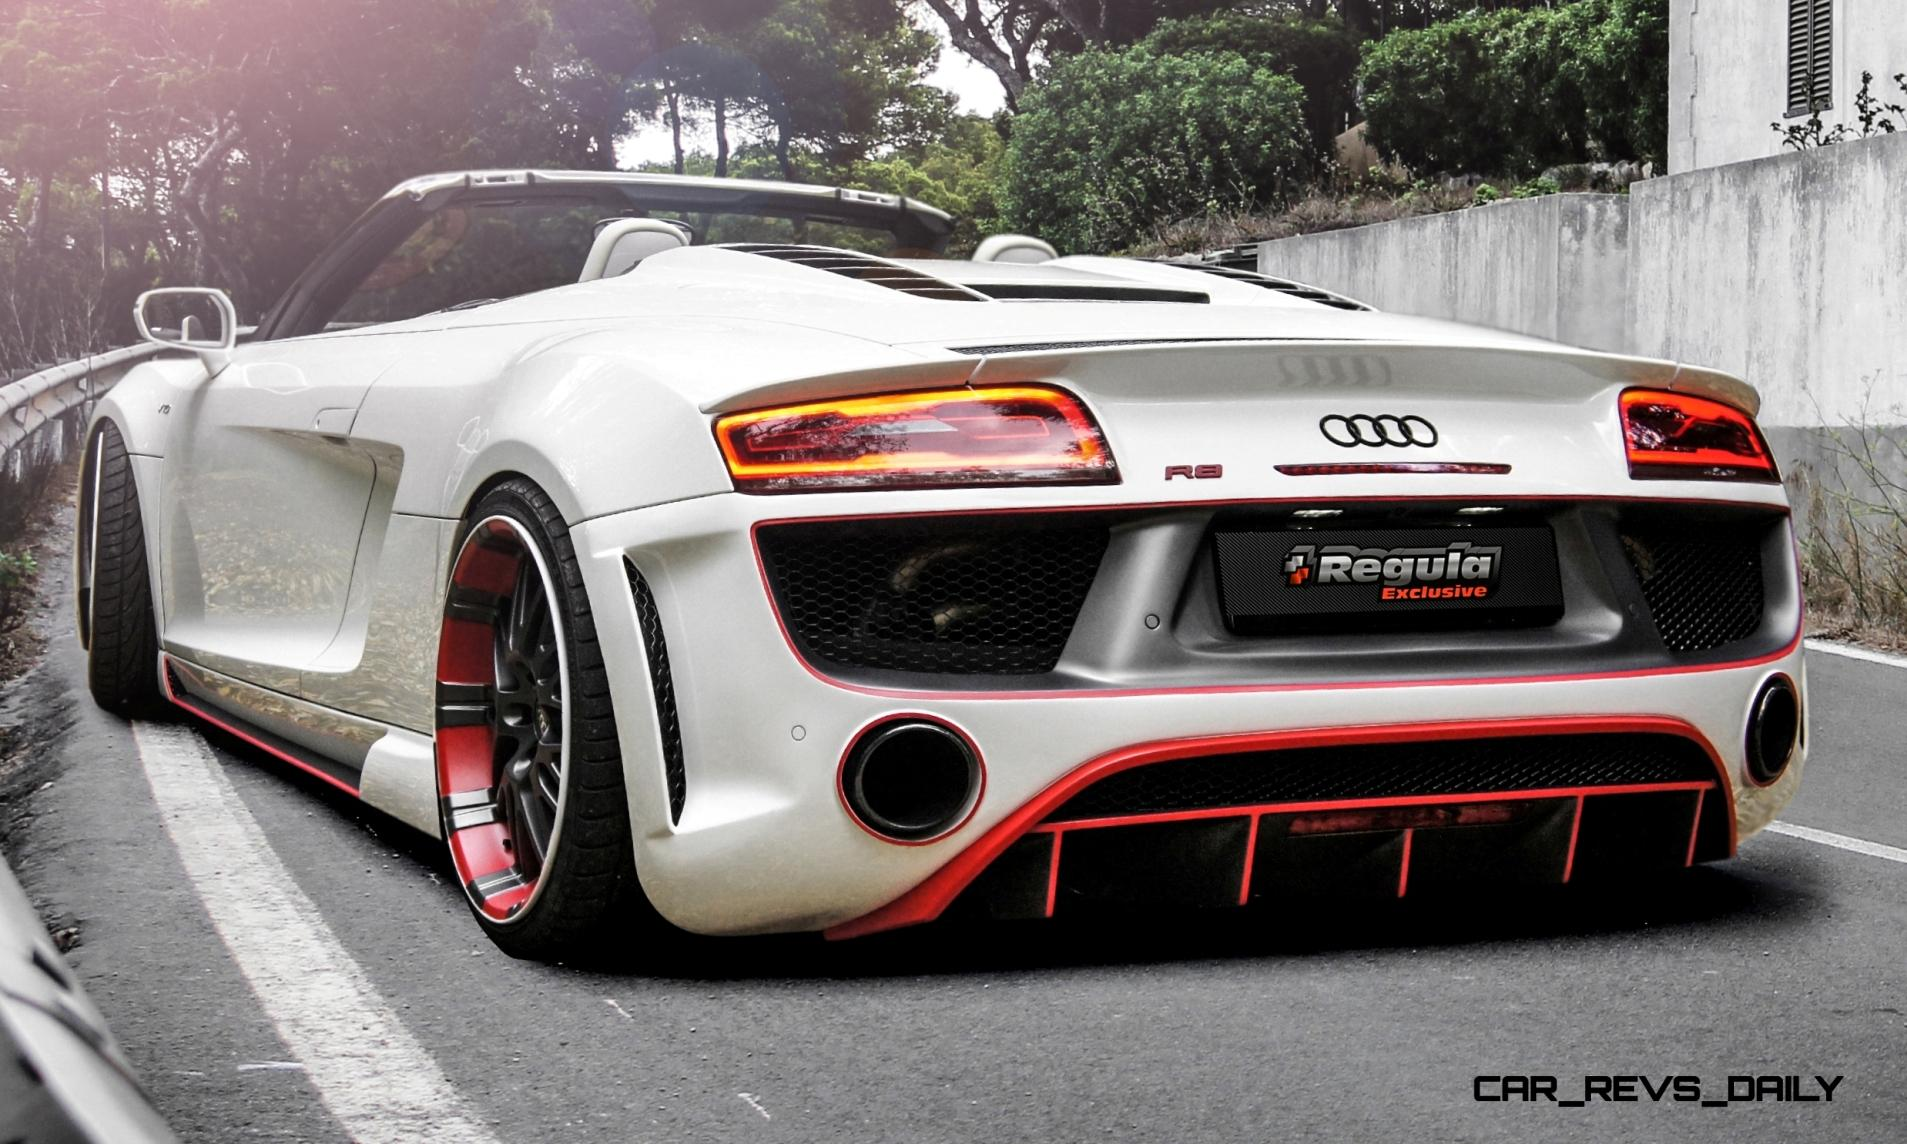 REGULA EXCLUSIVE Bodykits for Audi R8, Porsche Panamera and Porsche